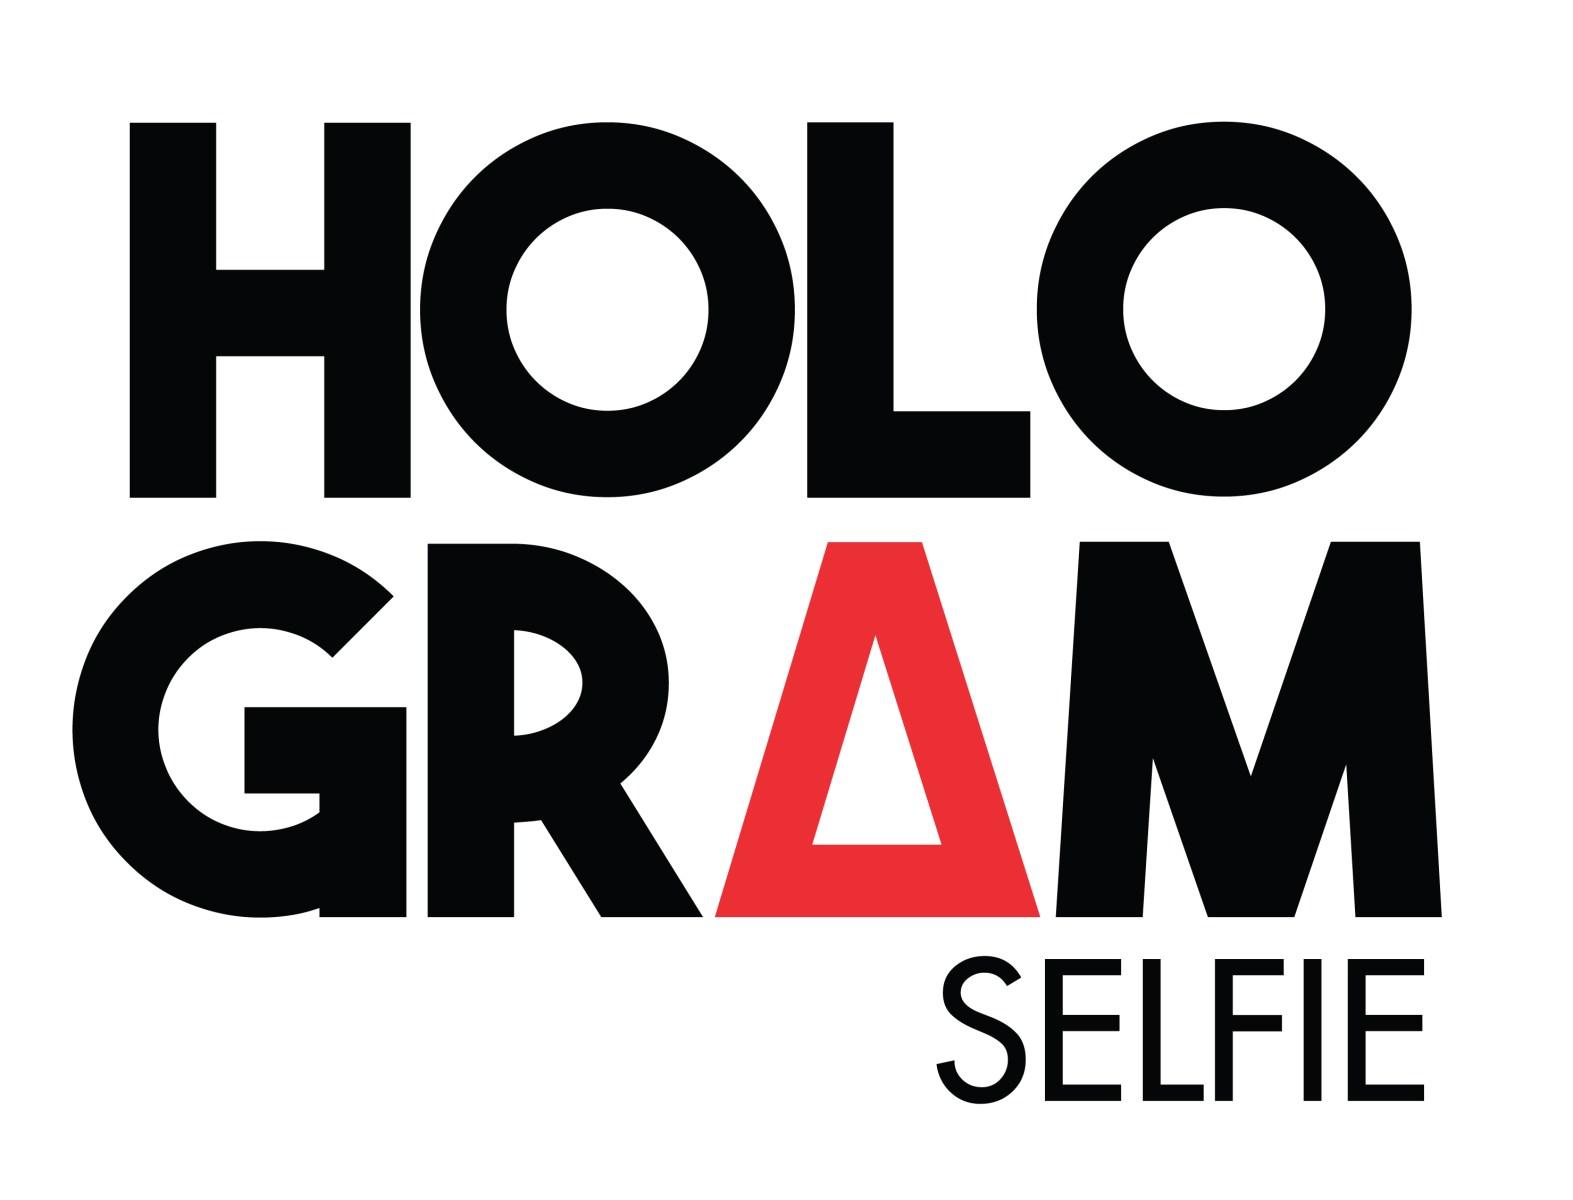 Hologram Selfie: The new way to Selfie